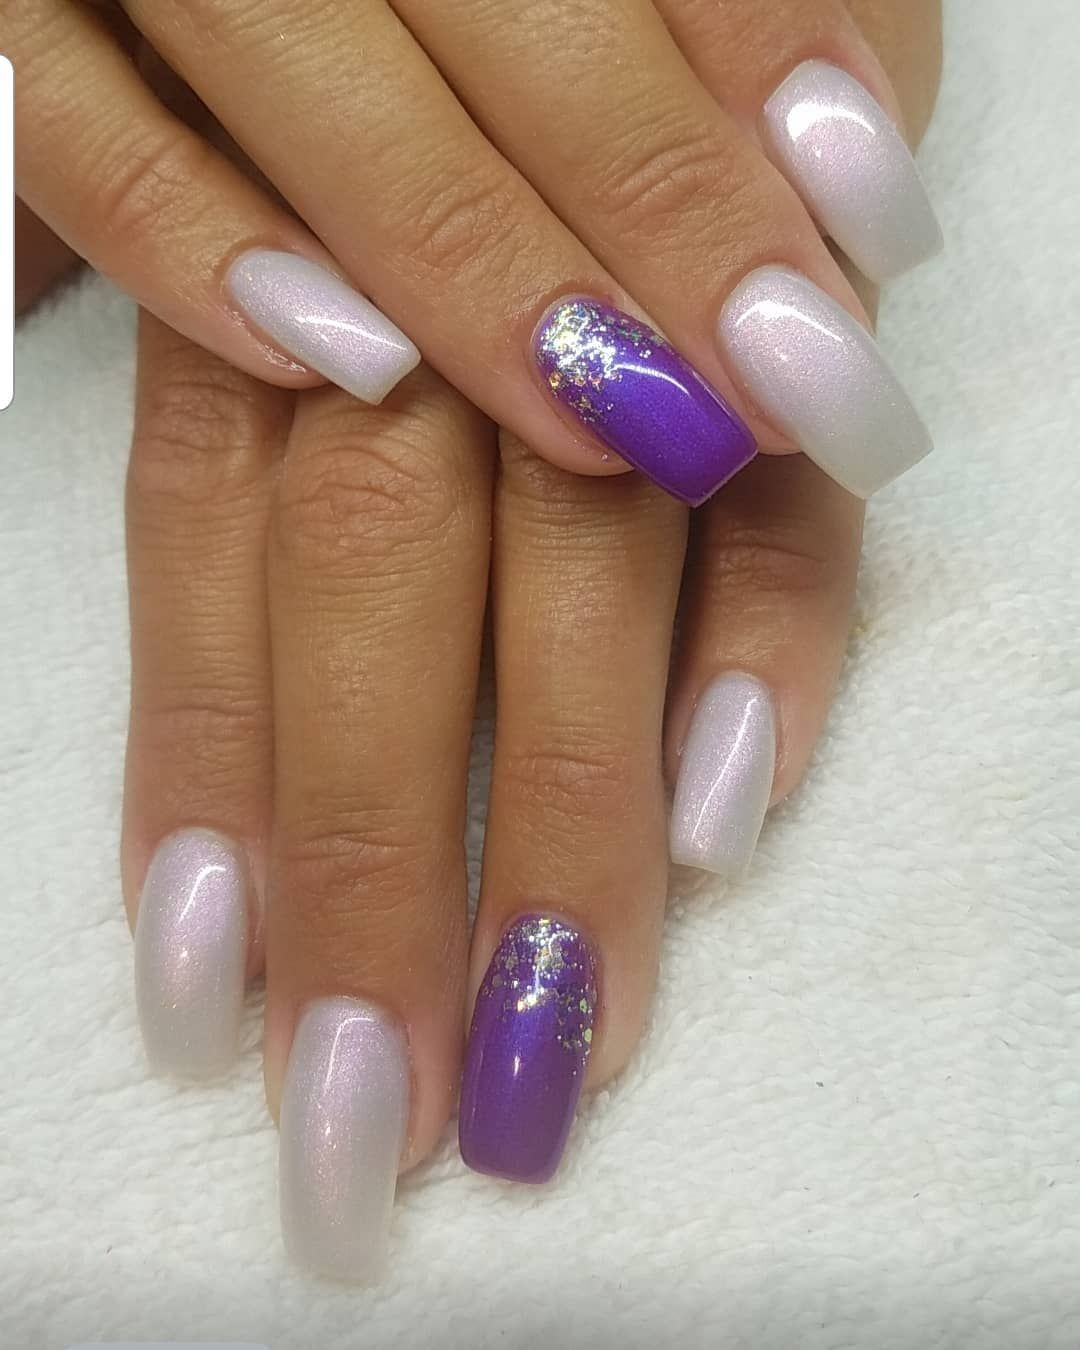 Nail De Simple Nail Polish Art Simple Nail Art Design 2016 Gel Nails Pictures Decent Nail Art Design Simple Nail Designs Toenail Polish Designs Pretty Nail Art